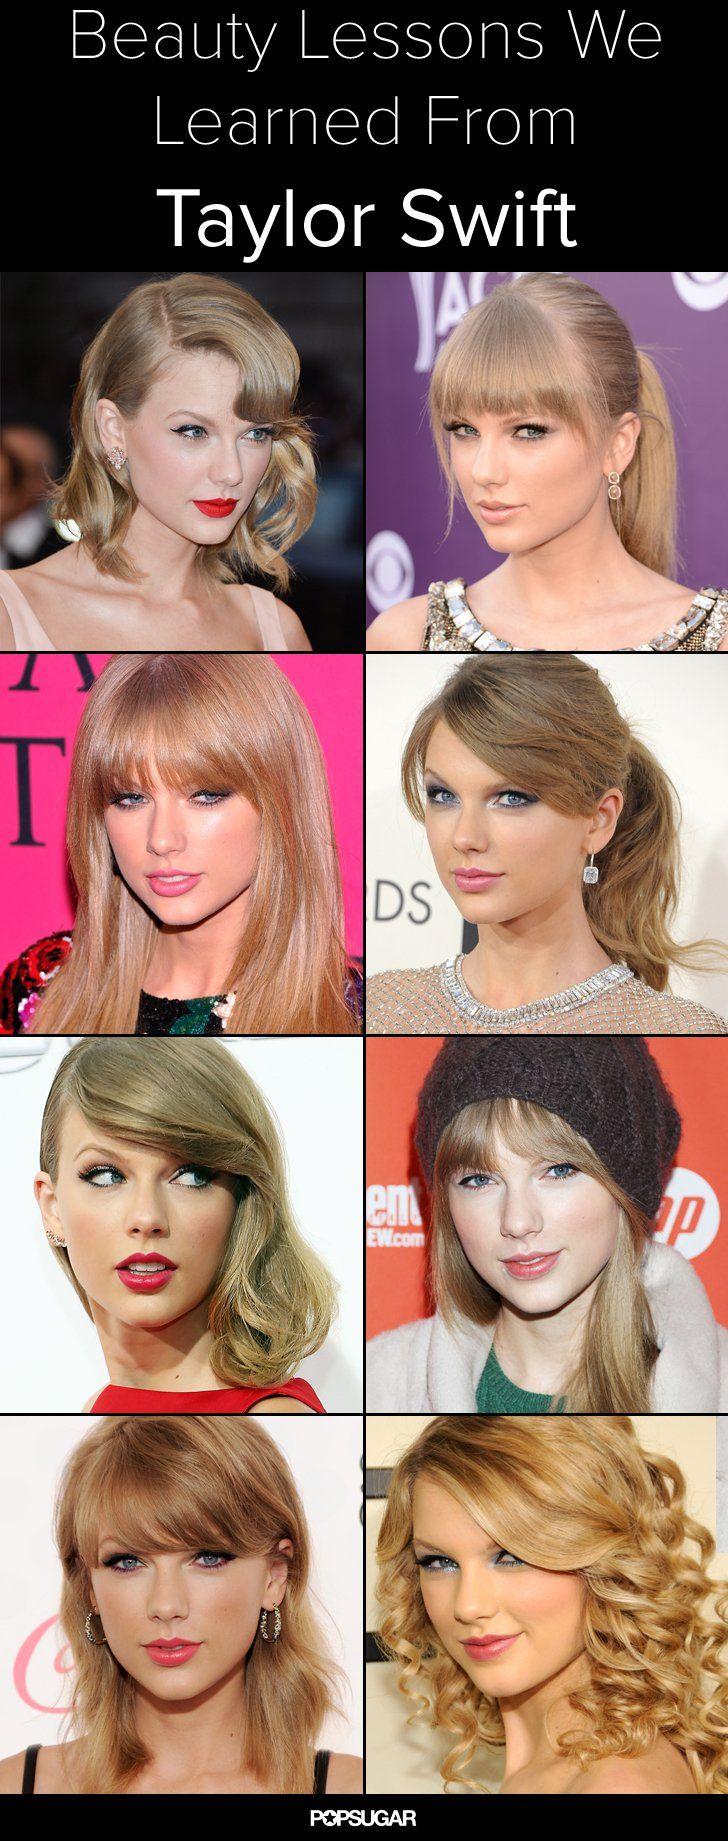 Pin for Later: 8 Conseils Pour Être Aussi Glamour que Taylor Swift